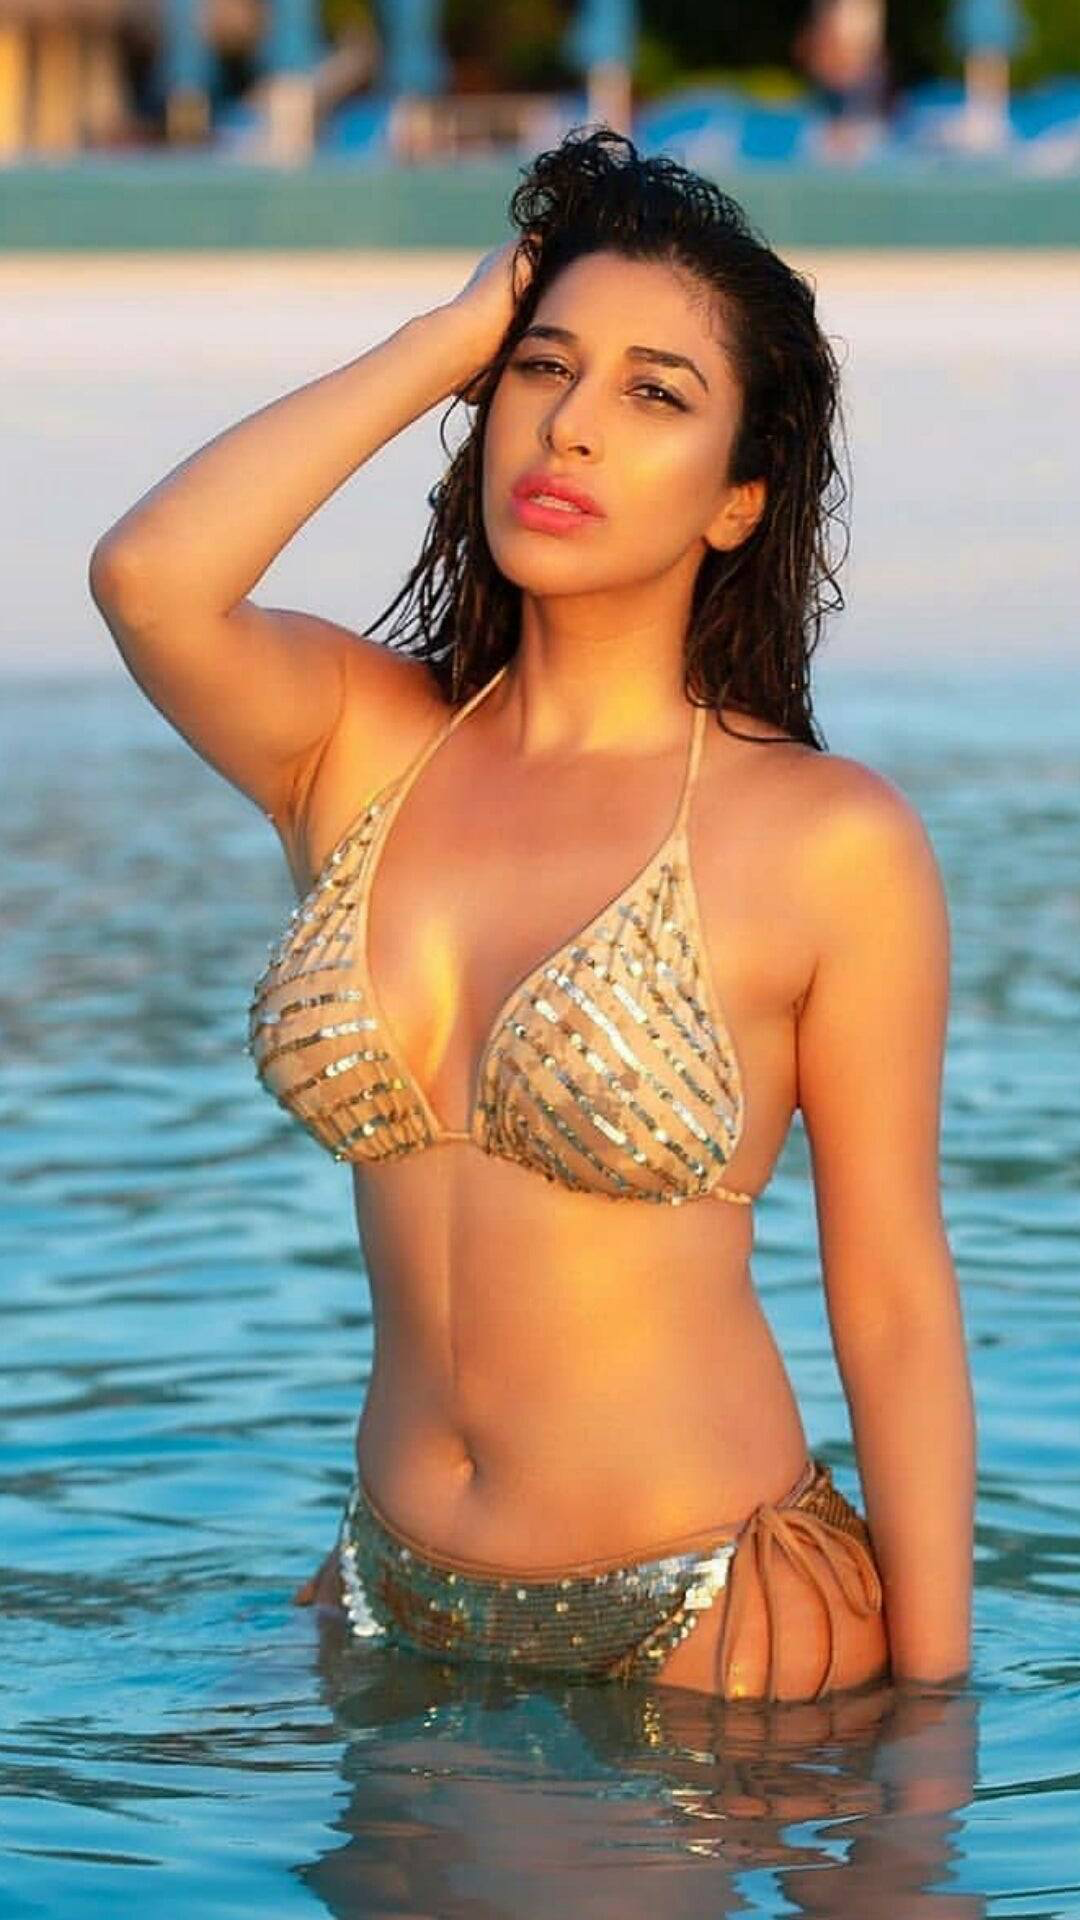 bikini pics choudhary Sophie